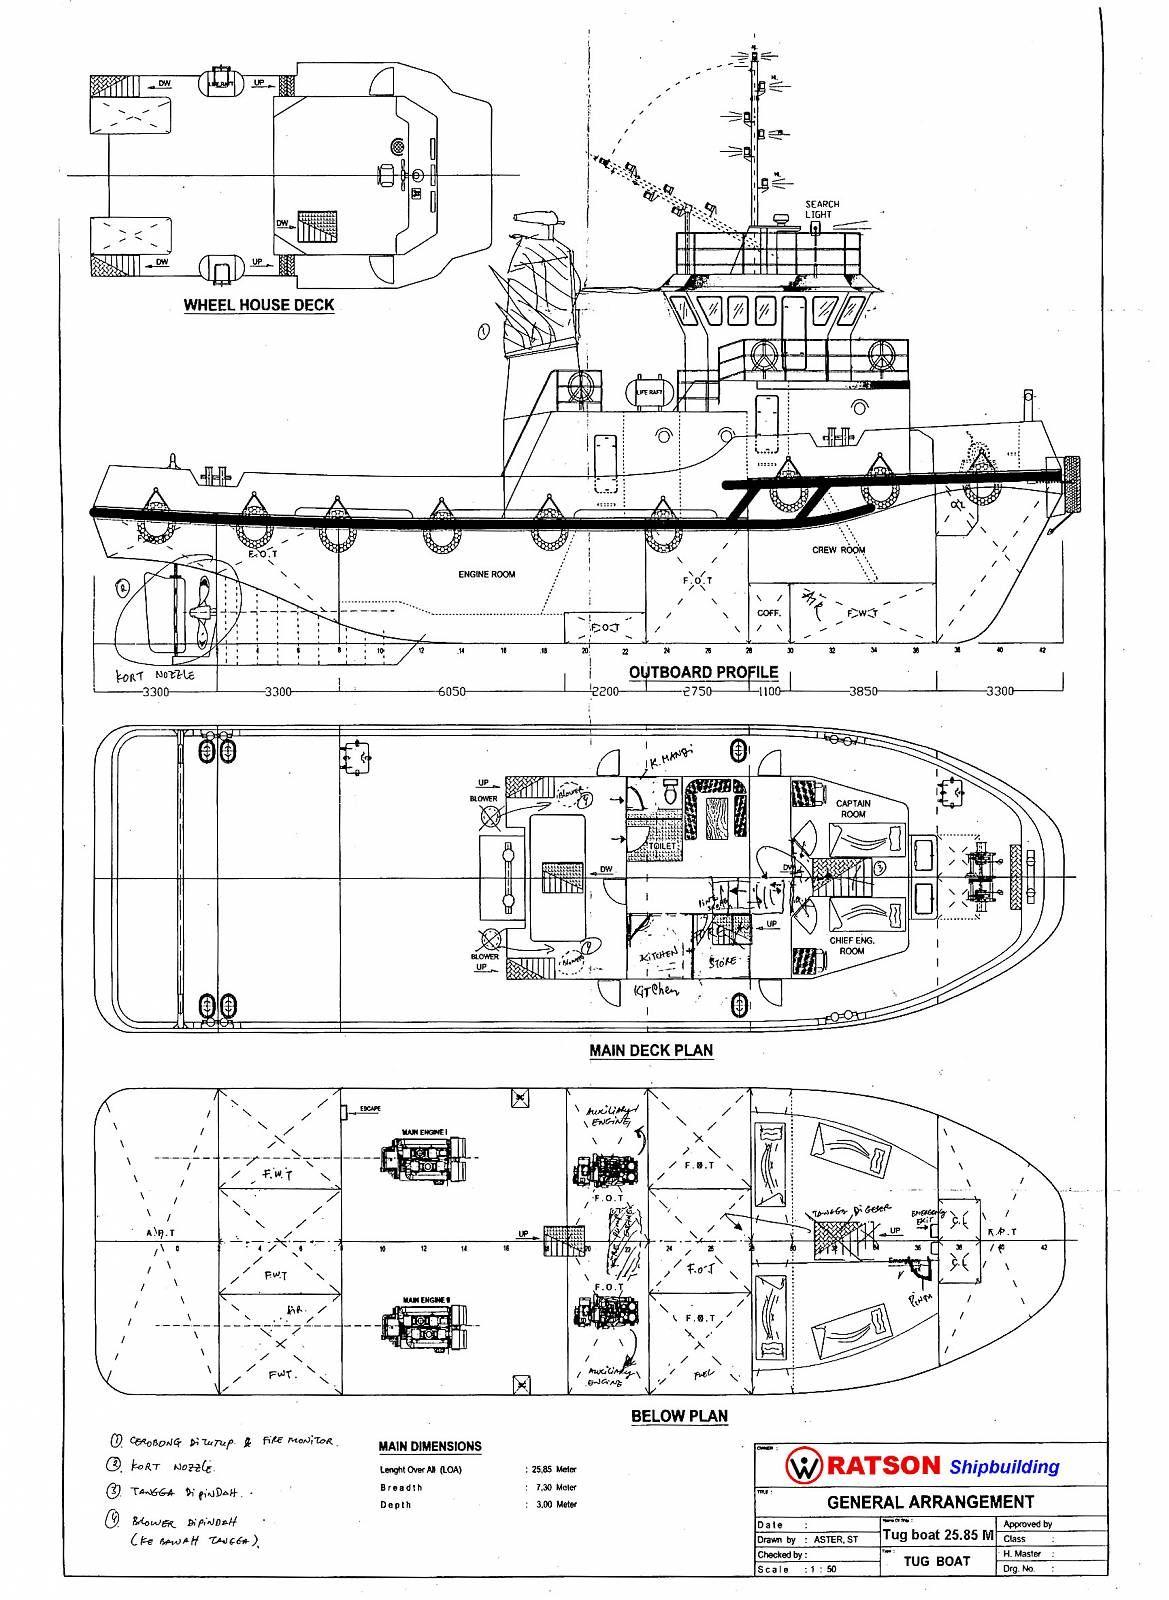 Http Www Boatdesign Net Forums Attachments Boat Design